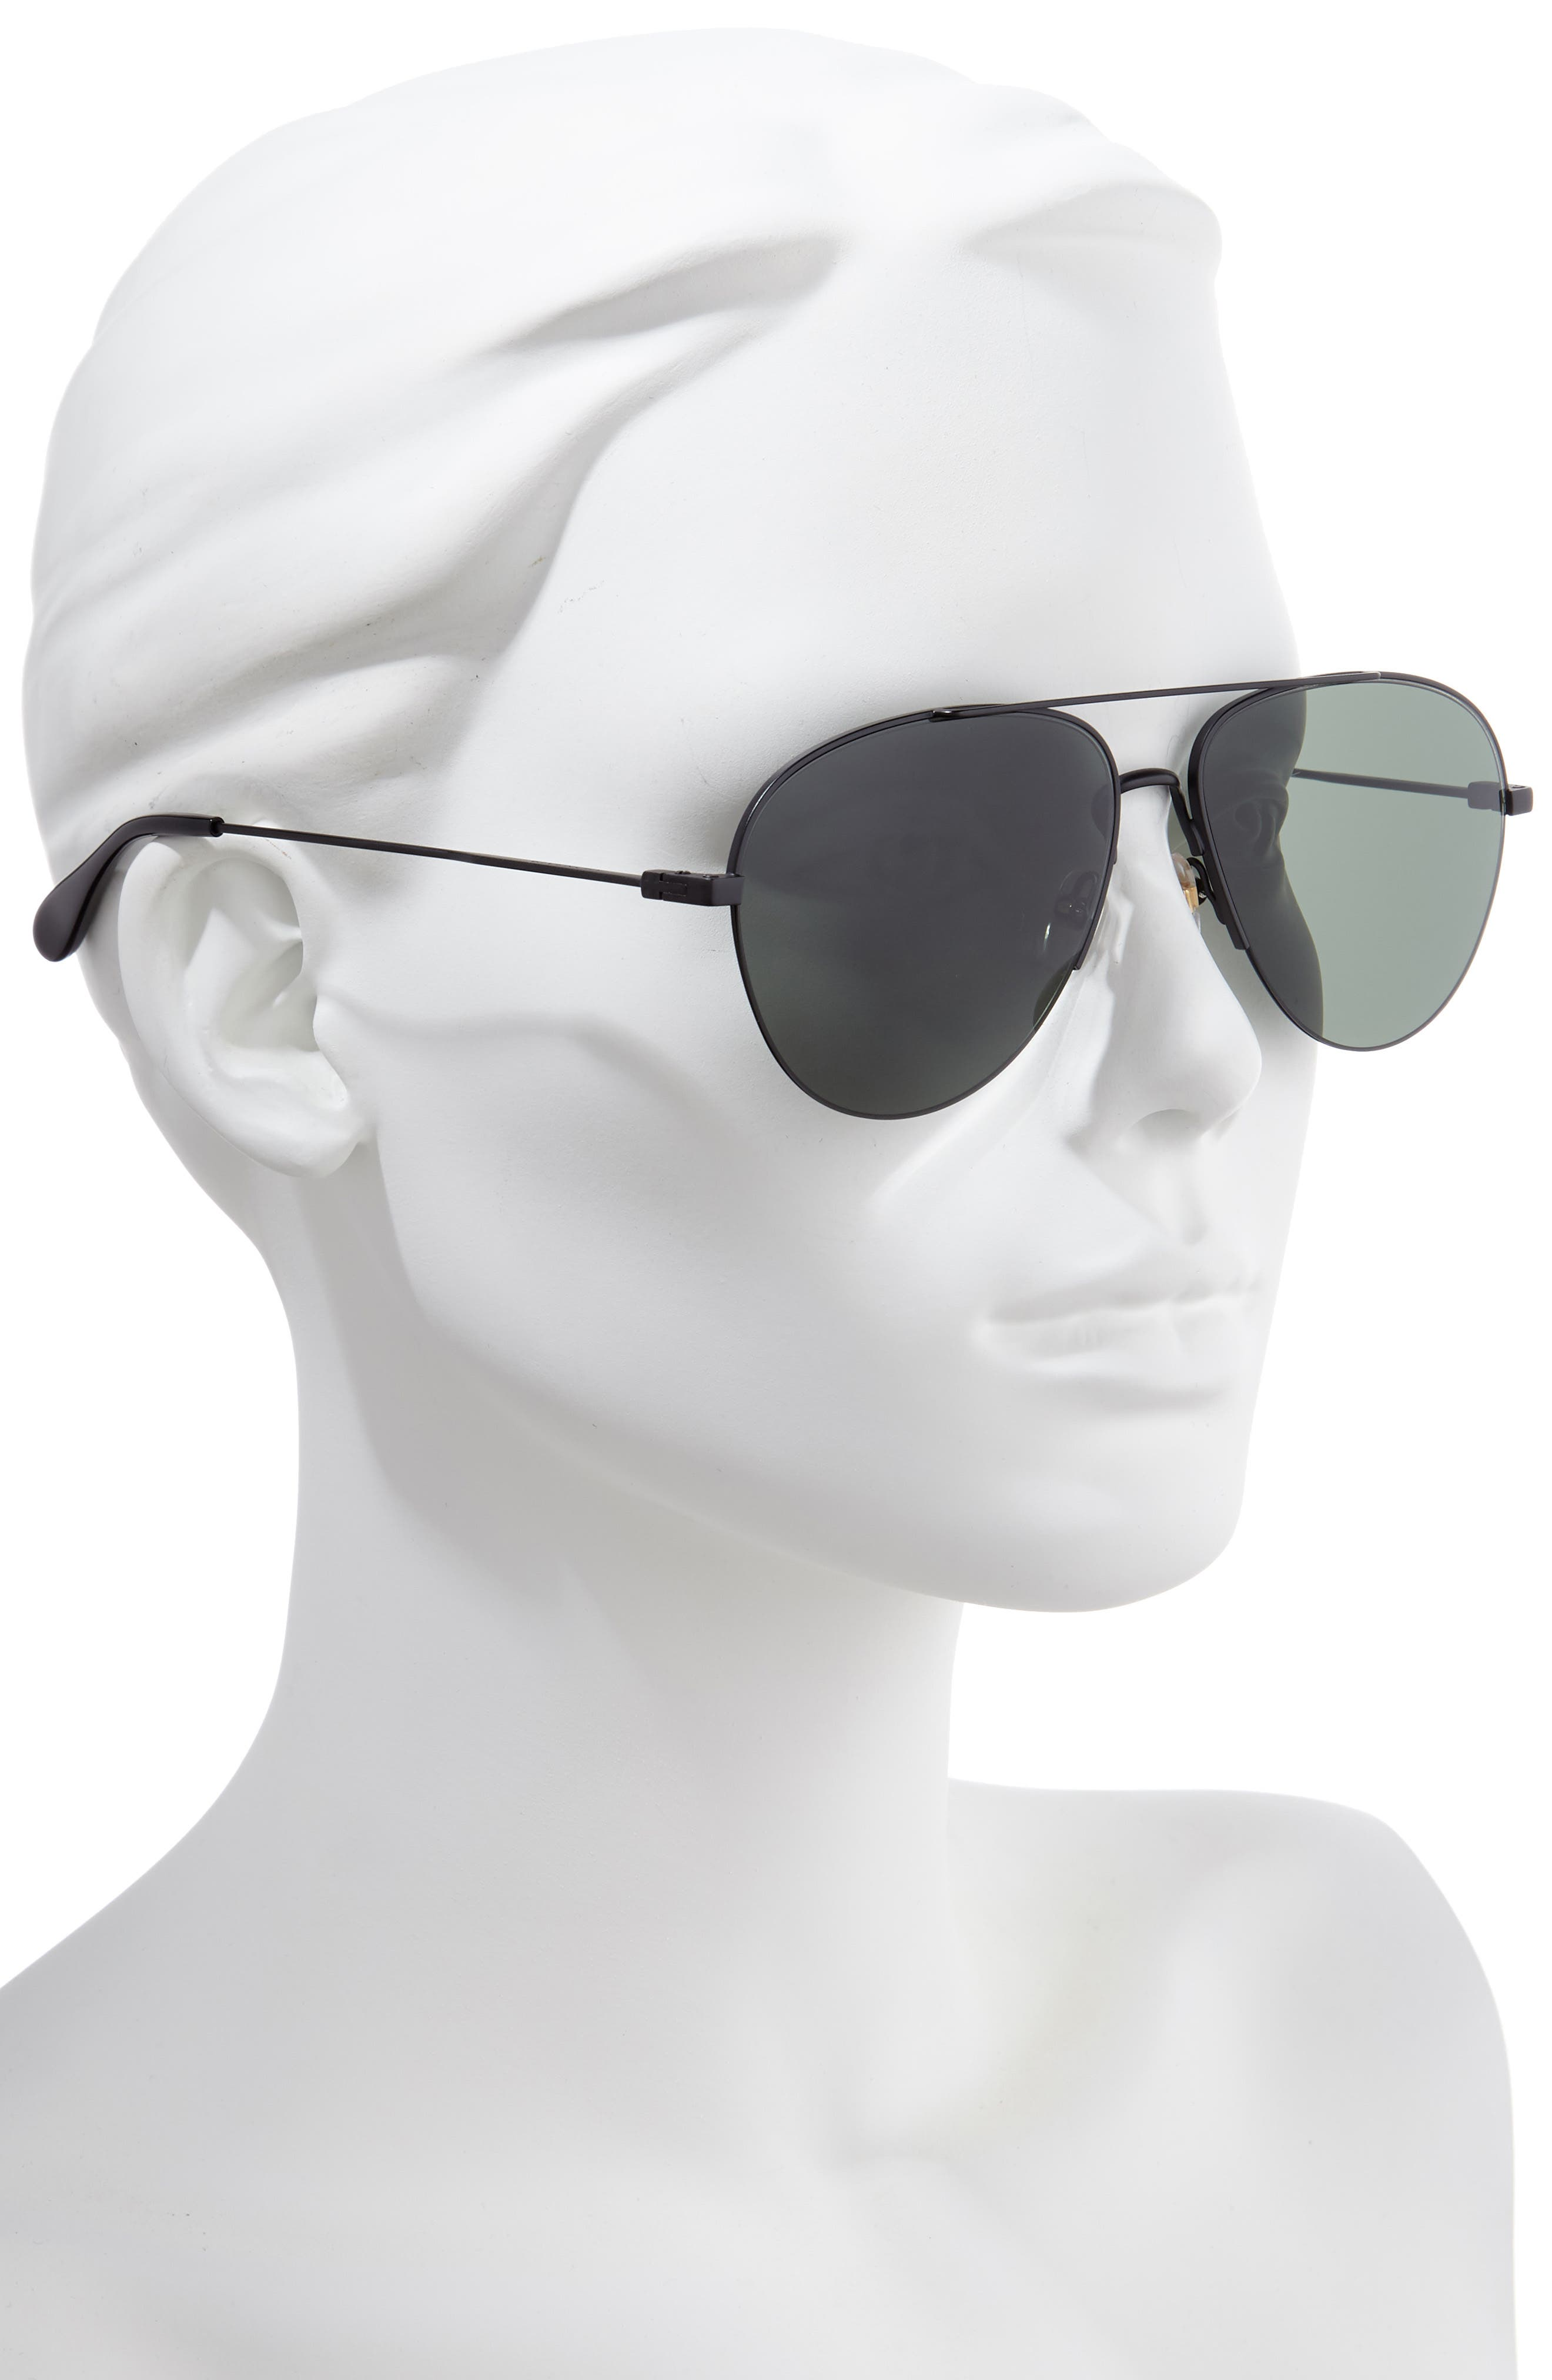 GIVENCHY,                             61mm Aviator Sunglasses,                             Alternate thumbnail 2, color,                             MATTE BLACK